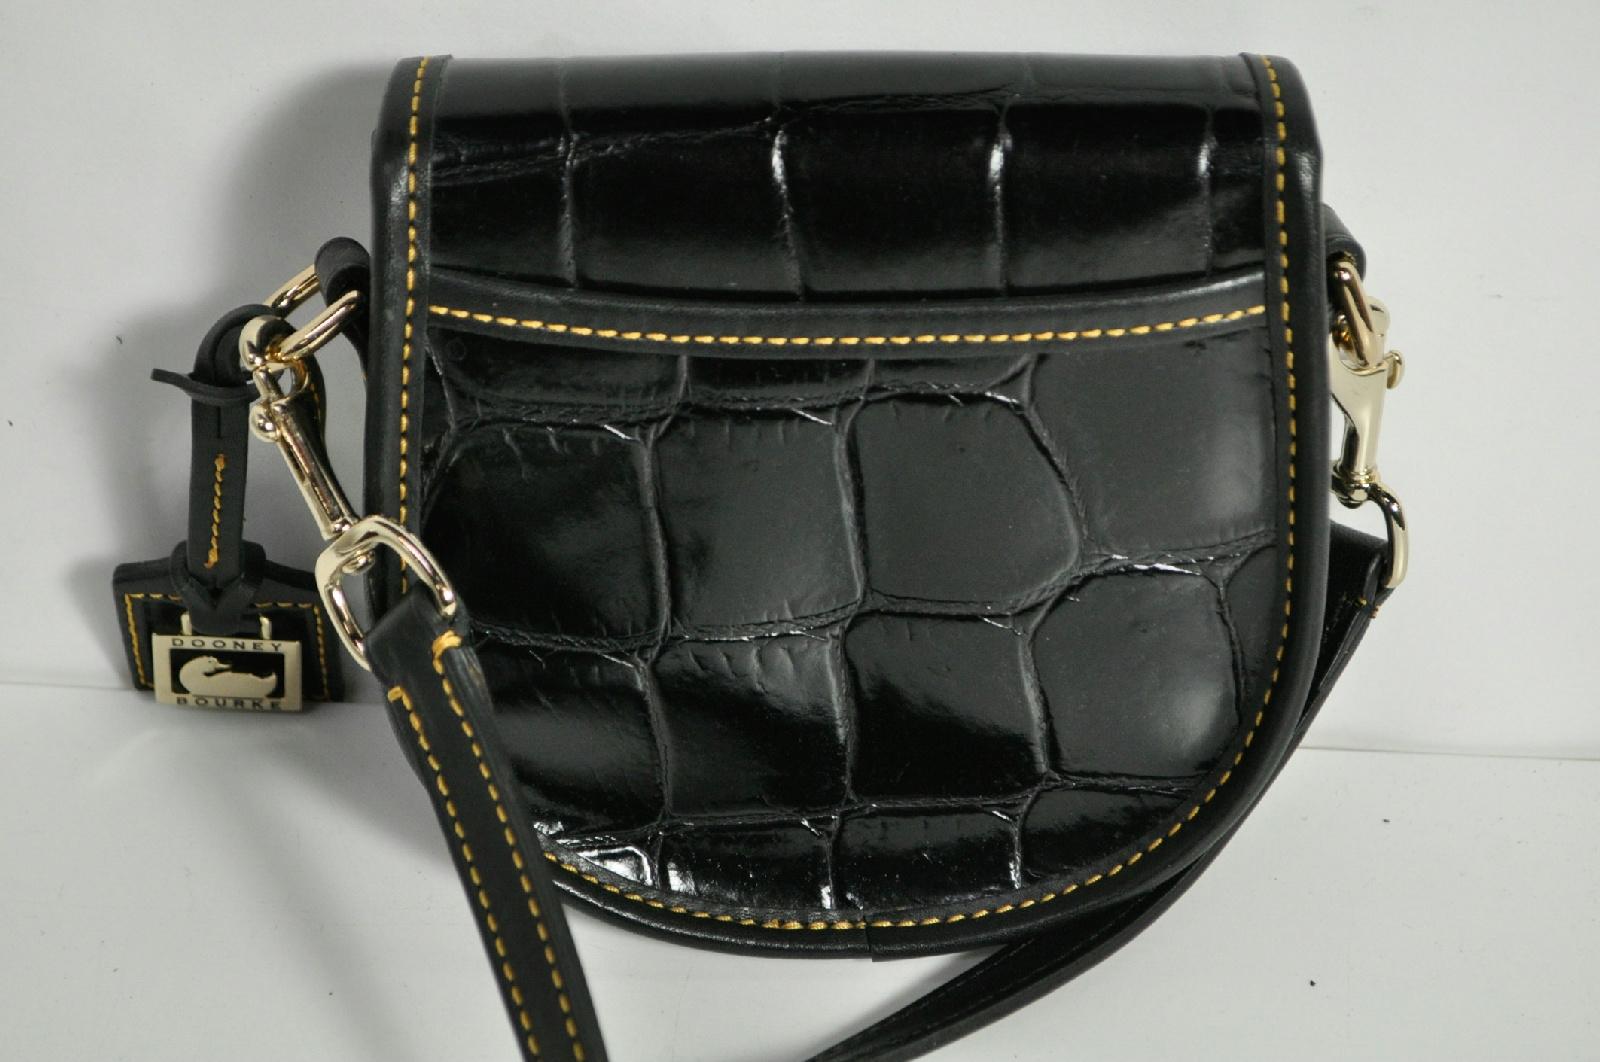 2ec4af318638ed Dooney & Bourke Black Small Button Long Strap Crossbody Bag Purse | eBay